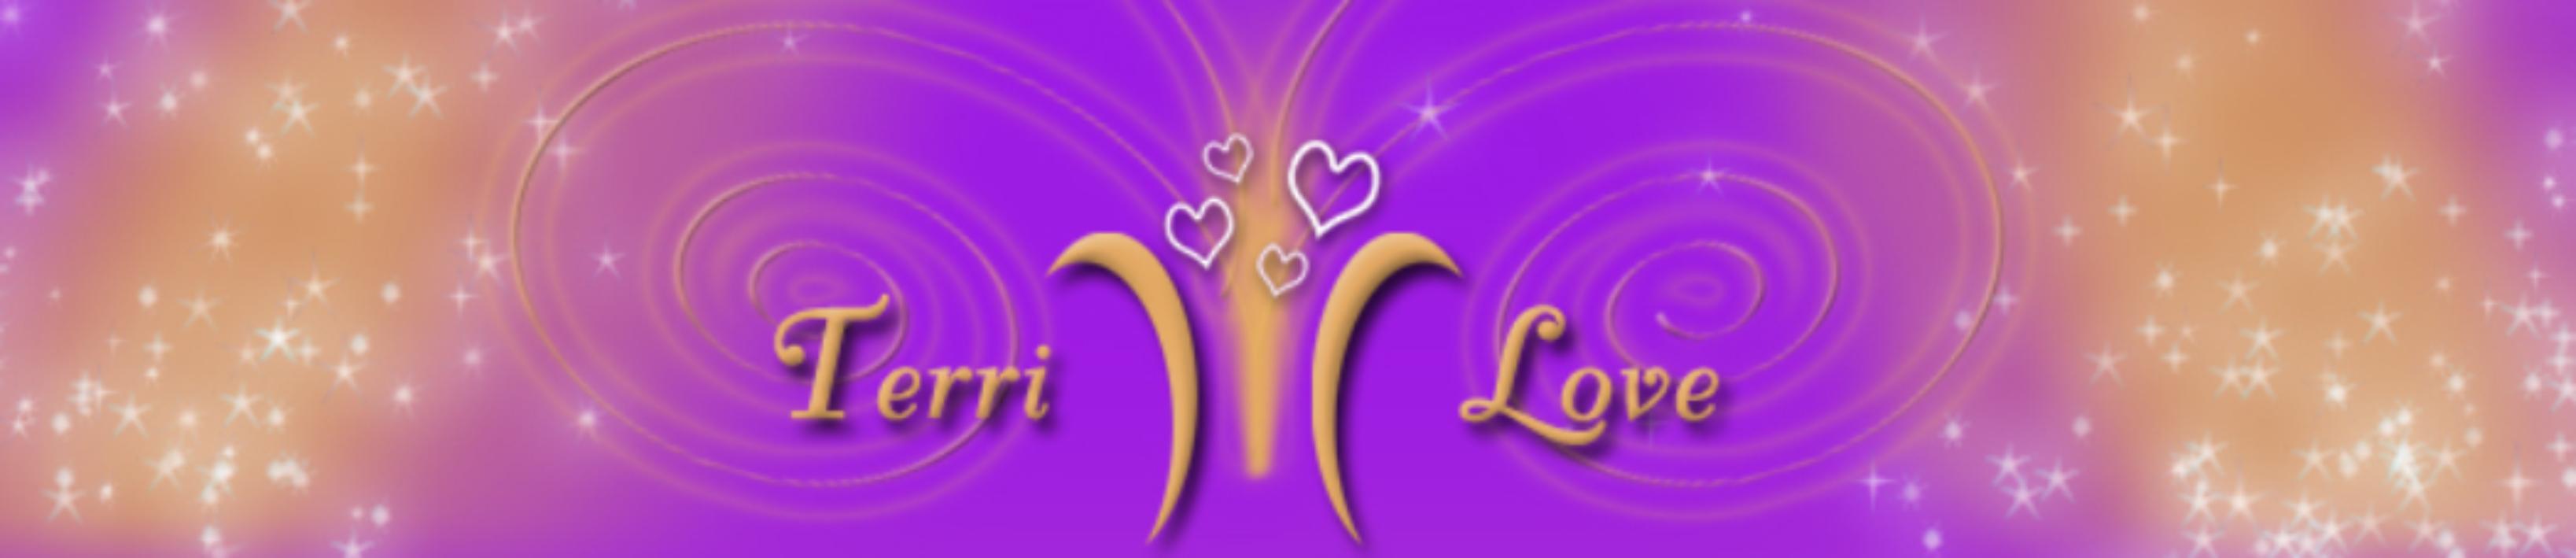 Terri Love